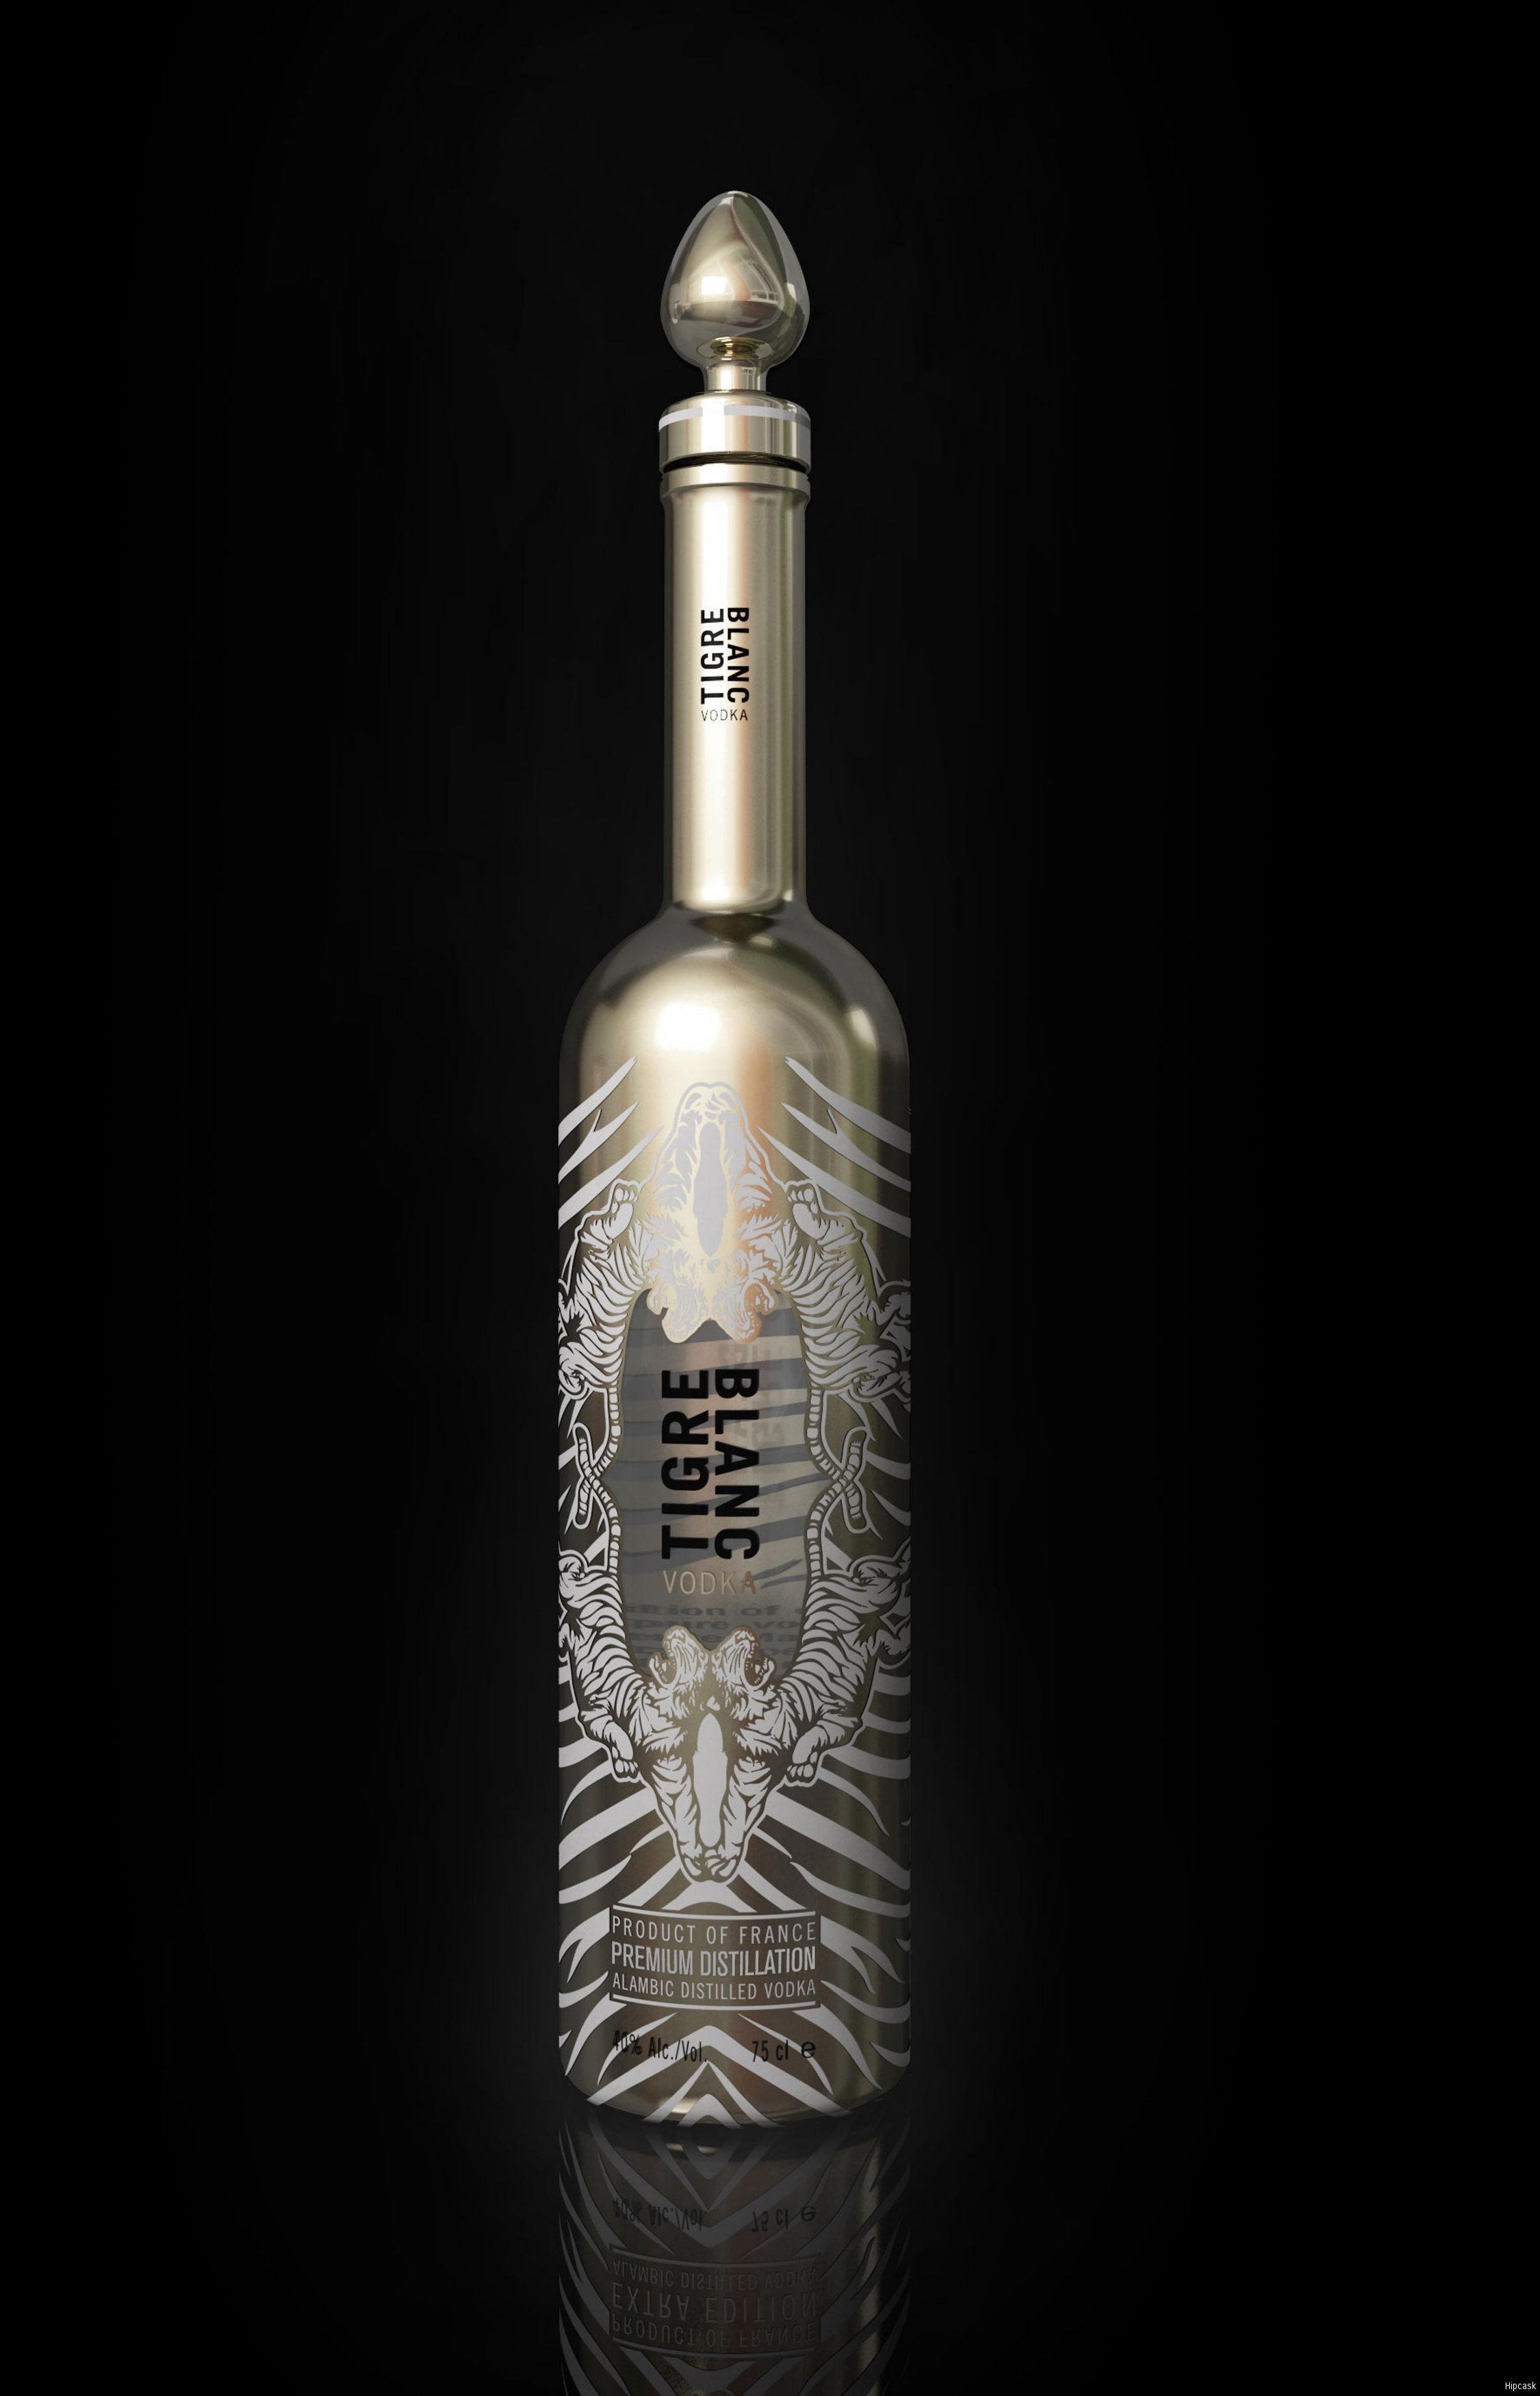 Tigre-Blanc-Alambic-Distilled-Special-Edition